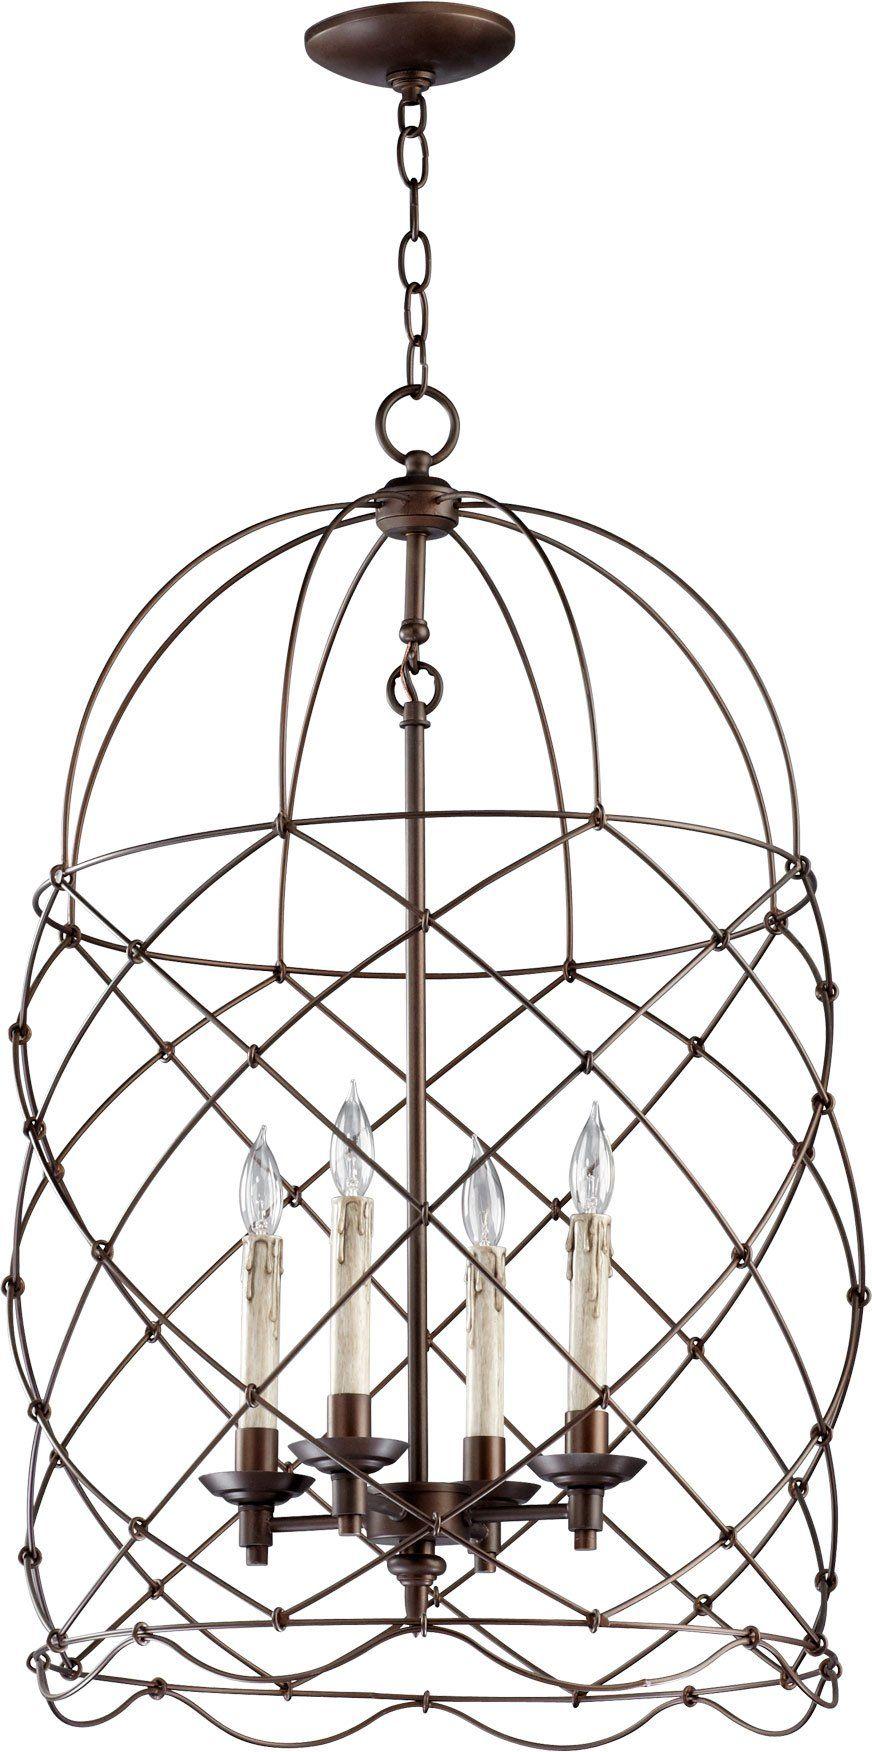 cyan design 04756 bird cages adele transitional foyer light cn 04756